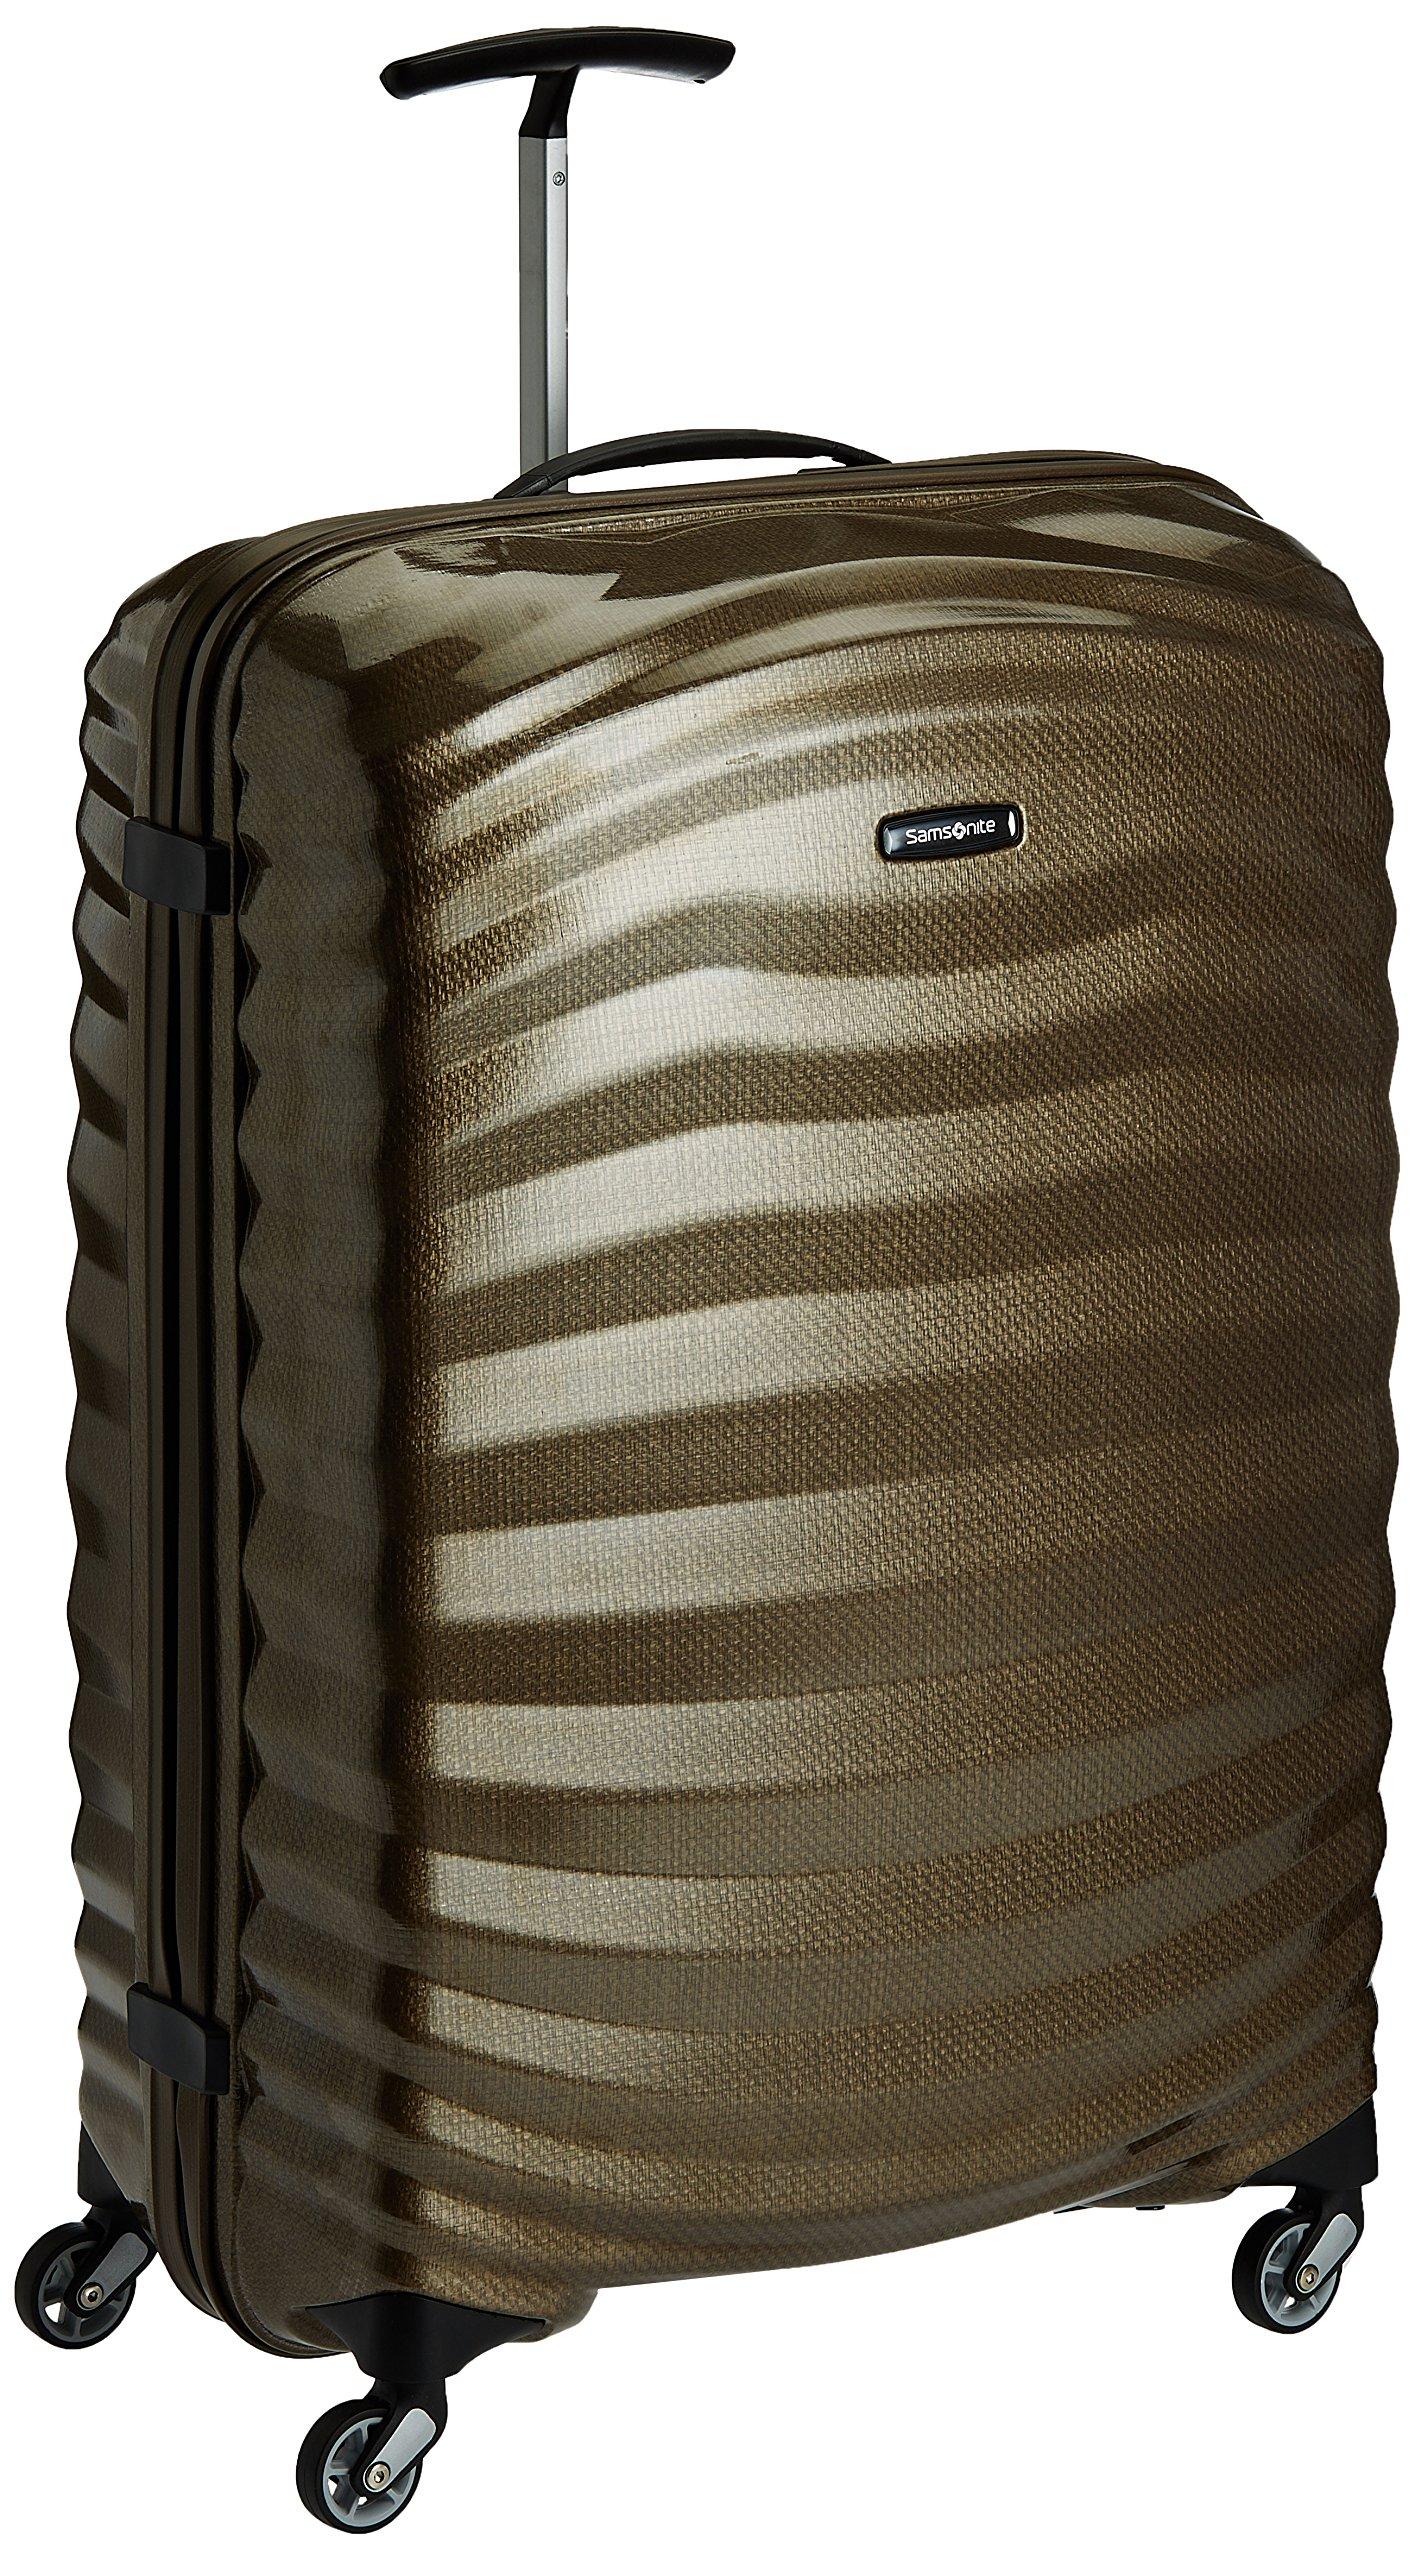 Samsonite-Lite-Shock-Koffer-L-75cm-985L